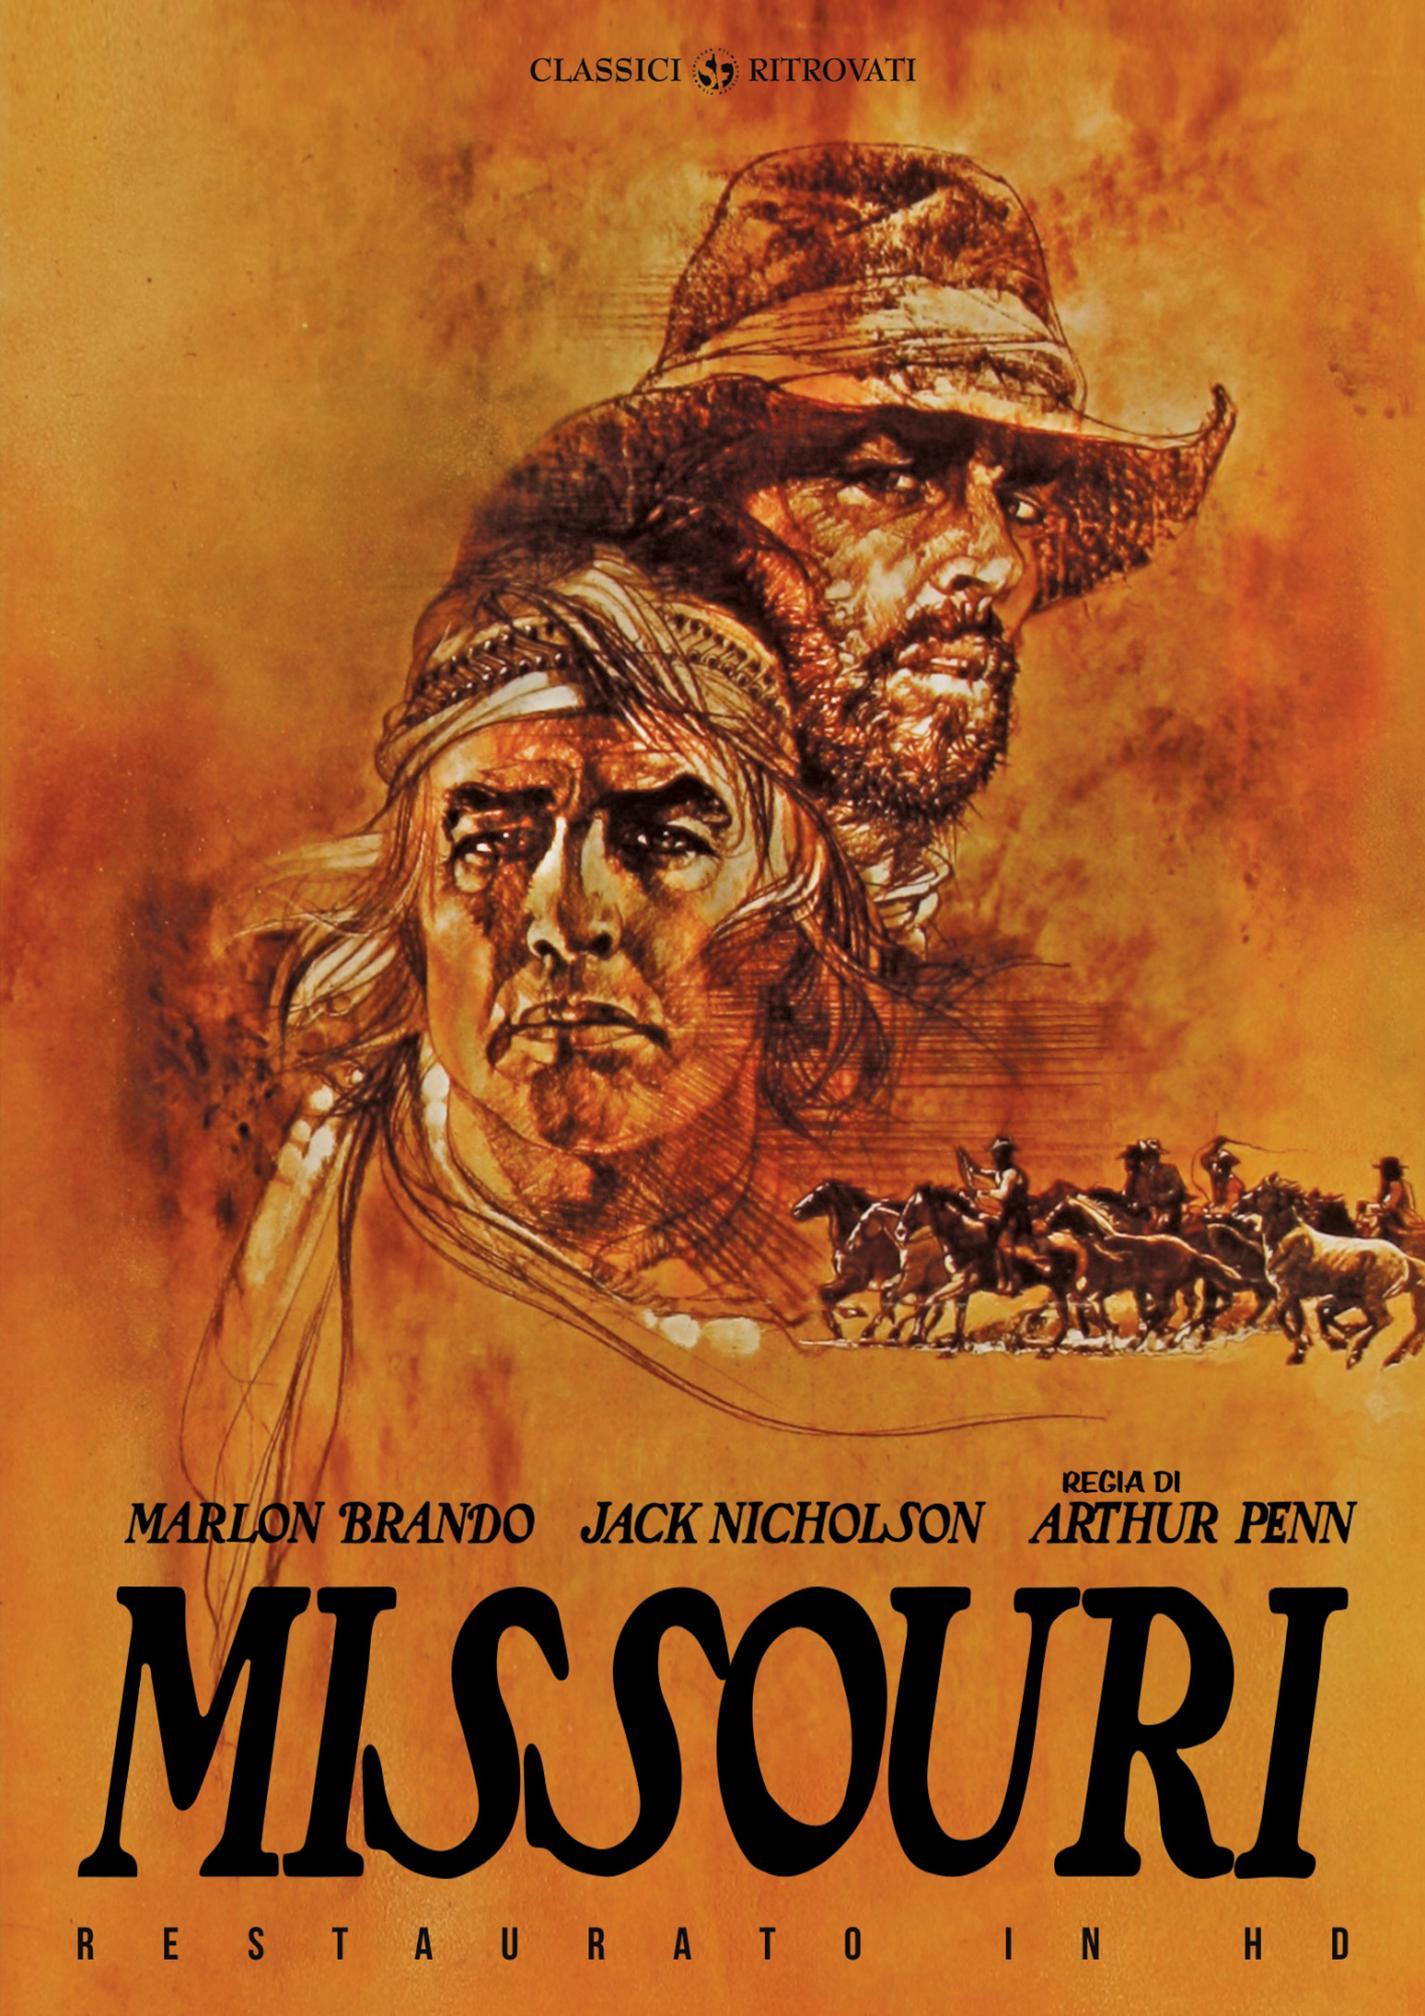 MISSOURI (RESTAURATO IN HD) (DVD)